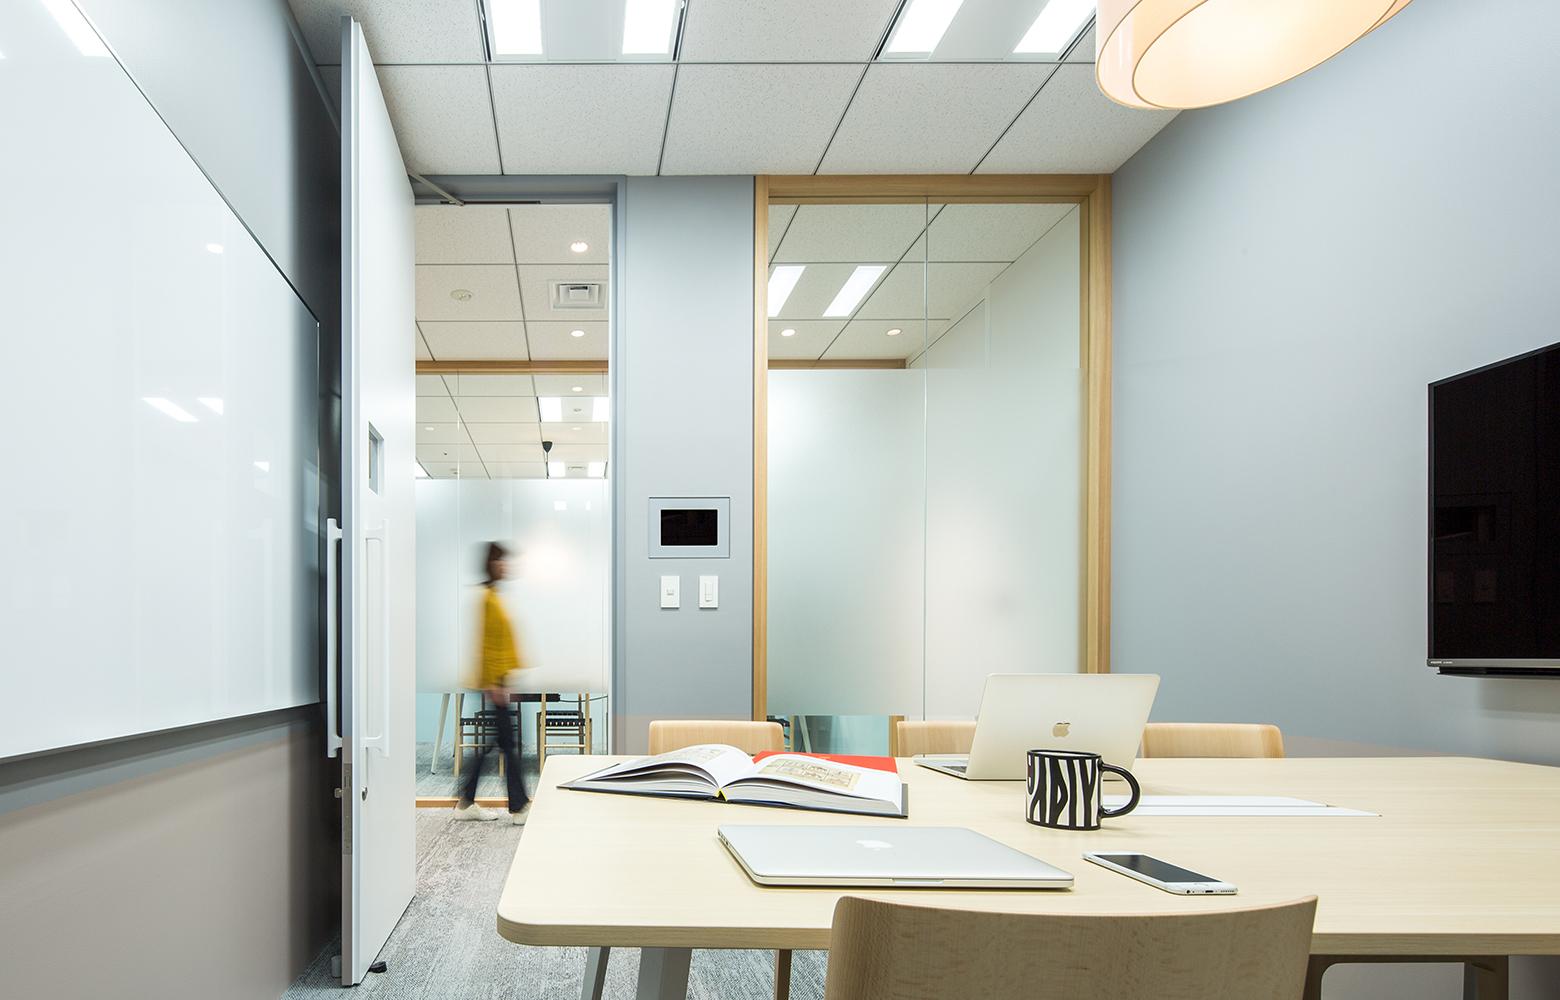 KLab株式会社 Roppongi Office Meeting Room_2 デザイン・レイアウト事例